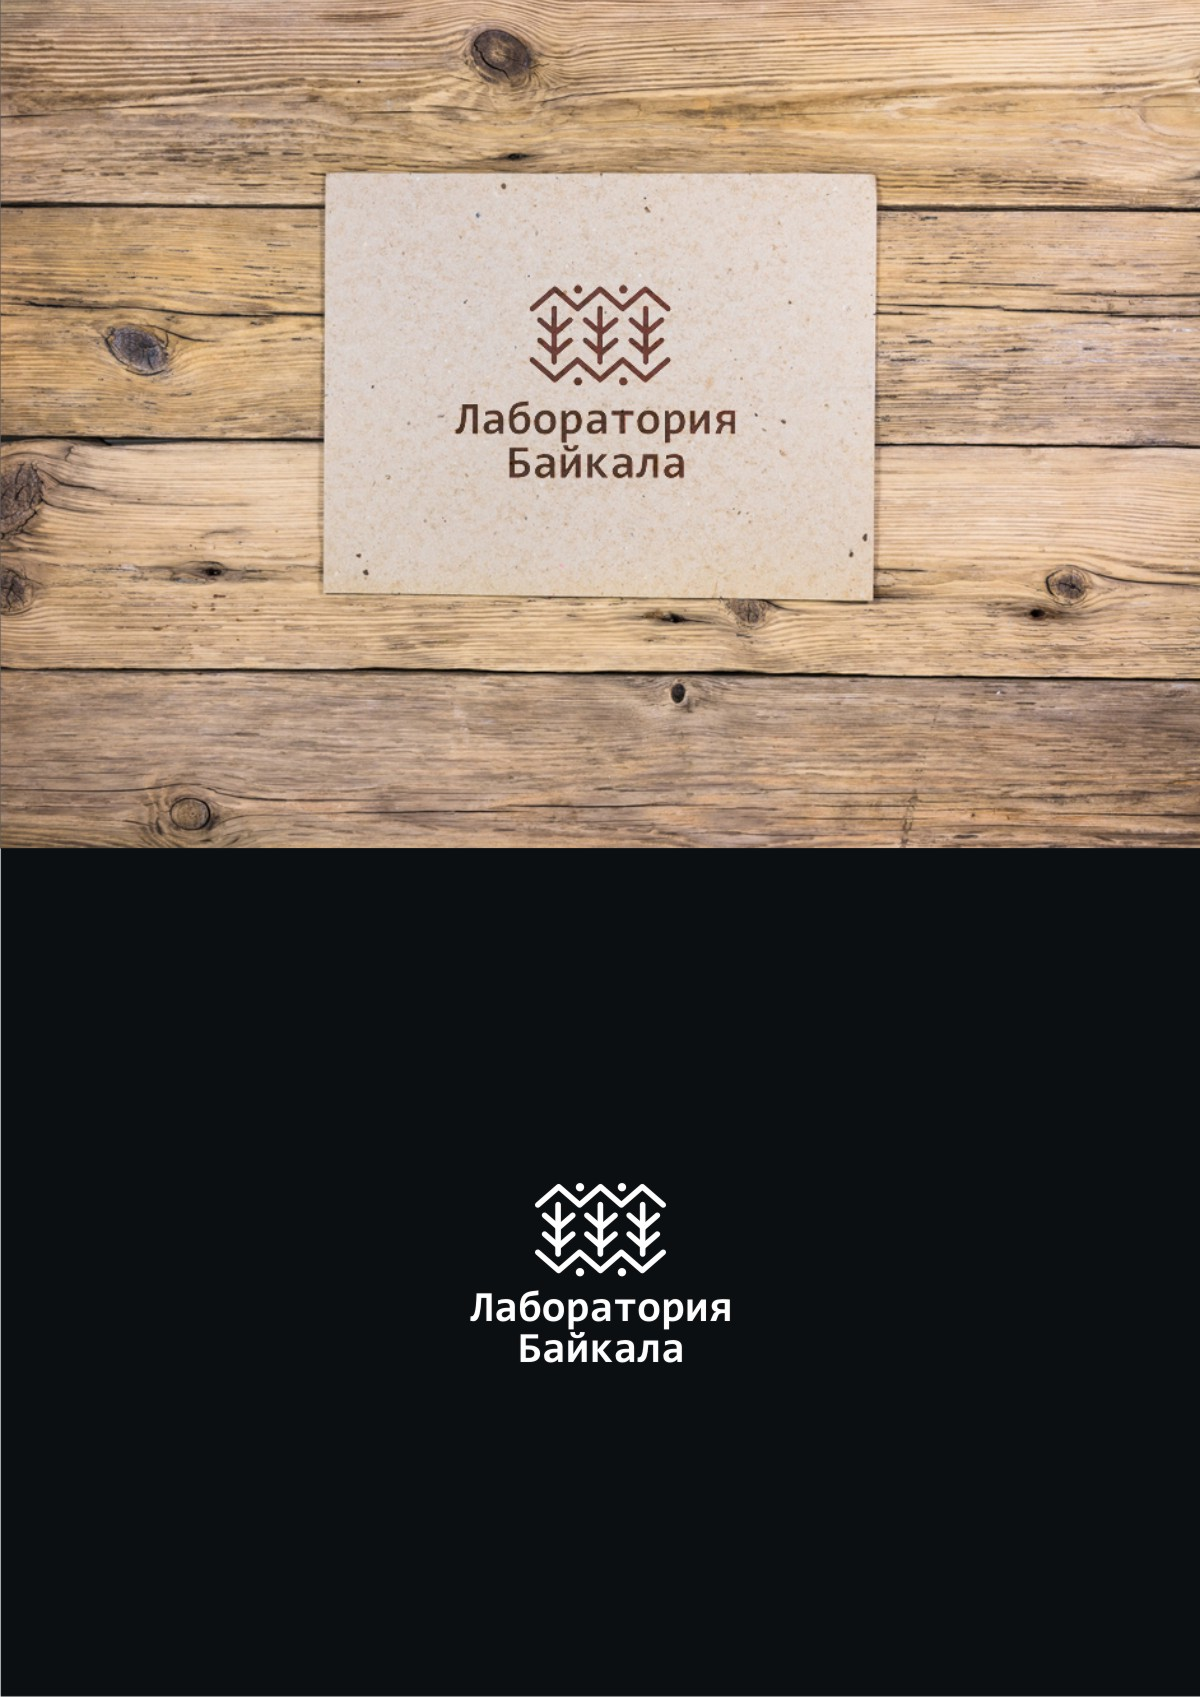 Разработка логотипа торговой марки фото f_210596b0d26a9dd8.jpg